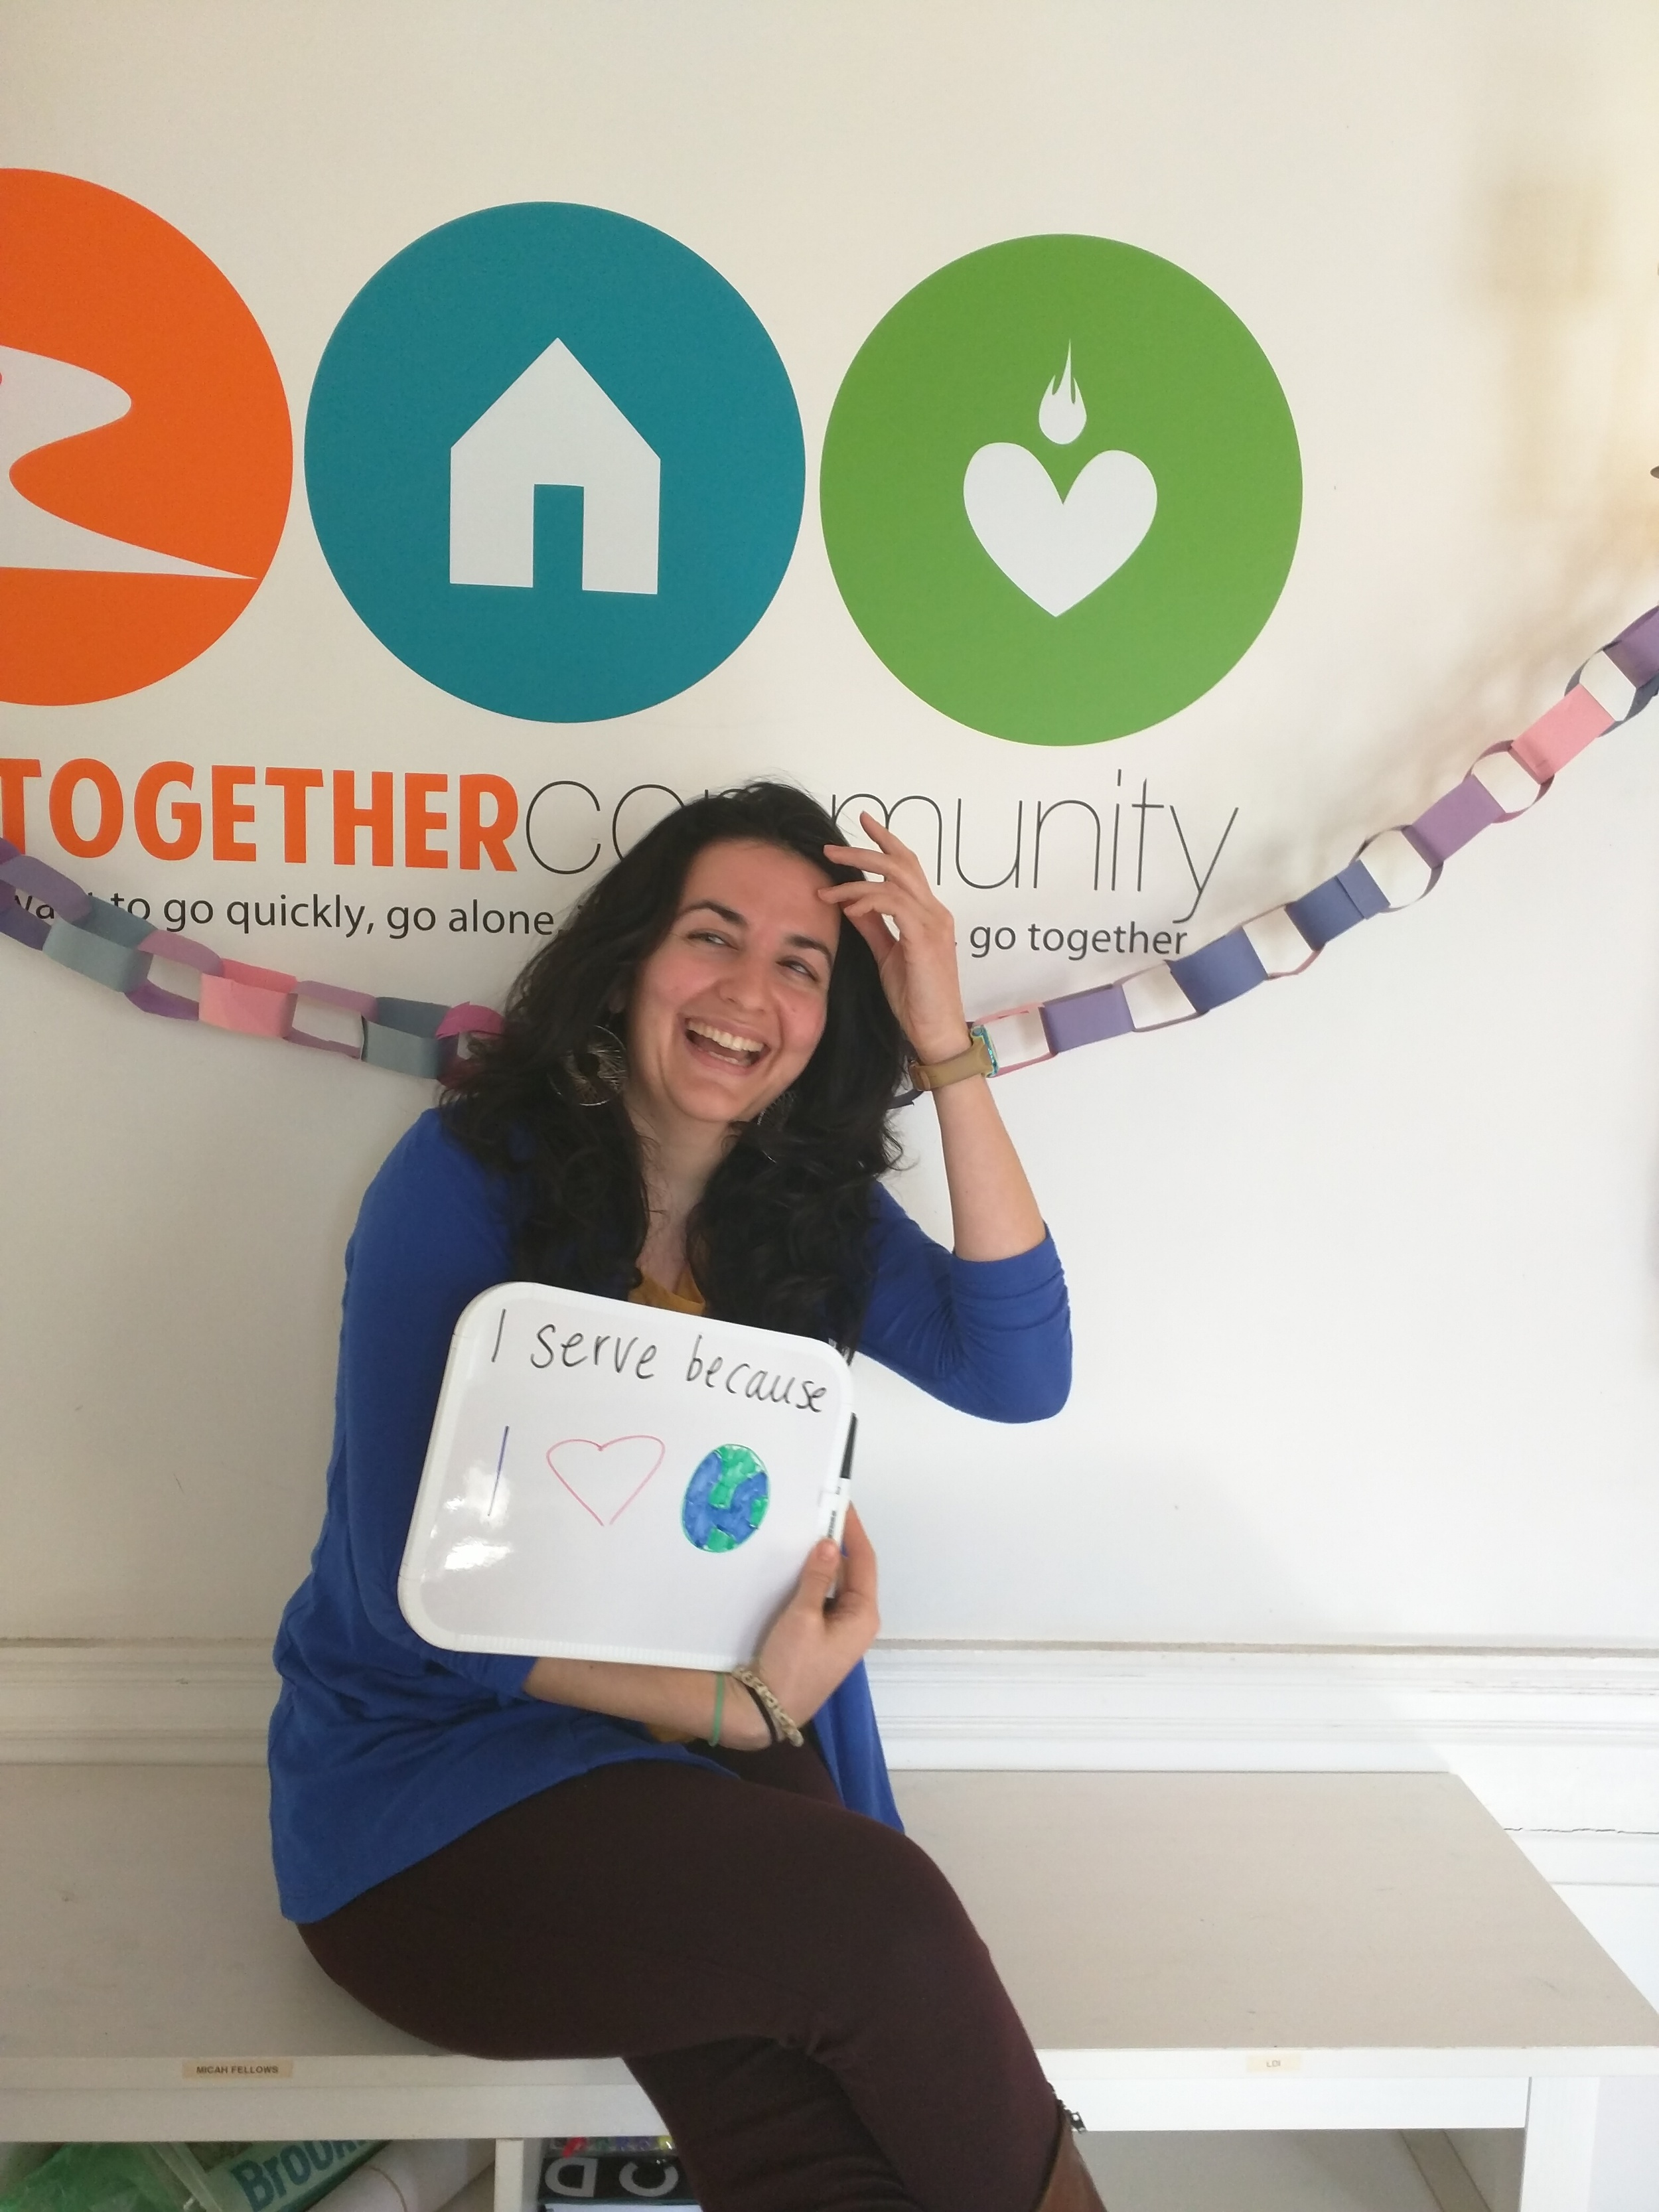 """I serve because I <3 [the world]"" - Rebecca Behizadeh, LT Director of Hiring and Development"